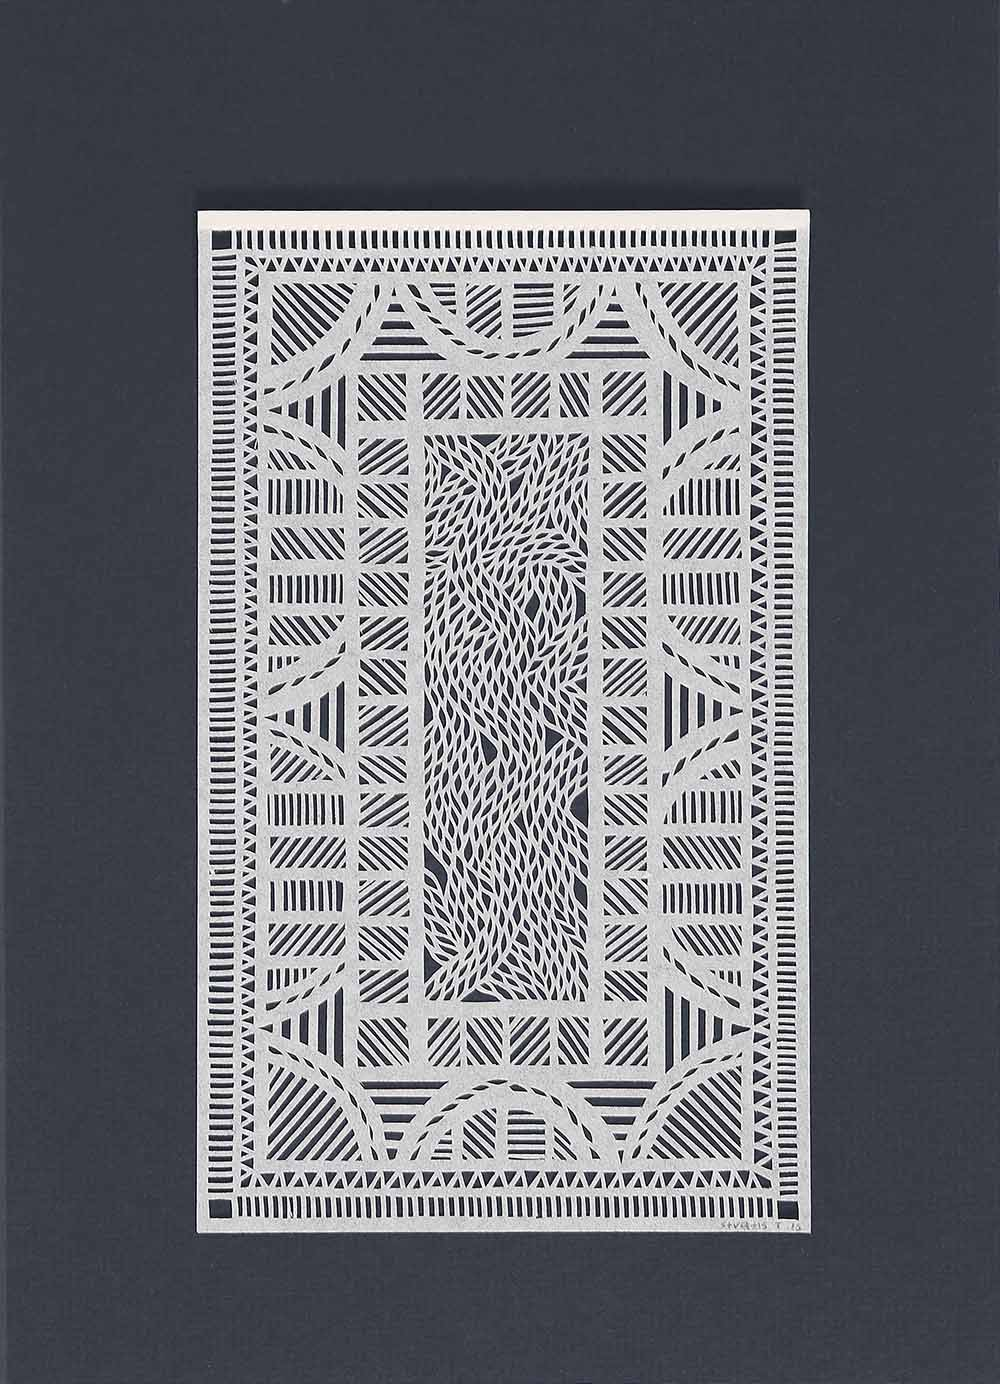 Untitled White Geometrical